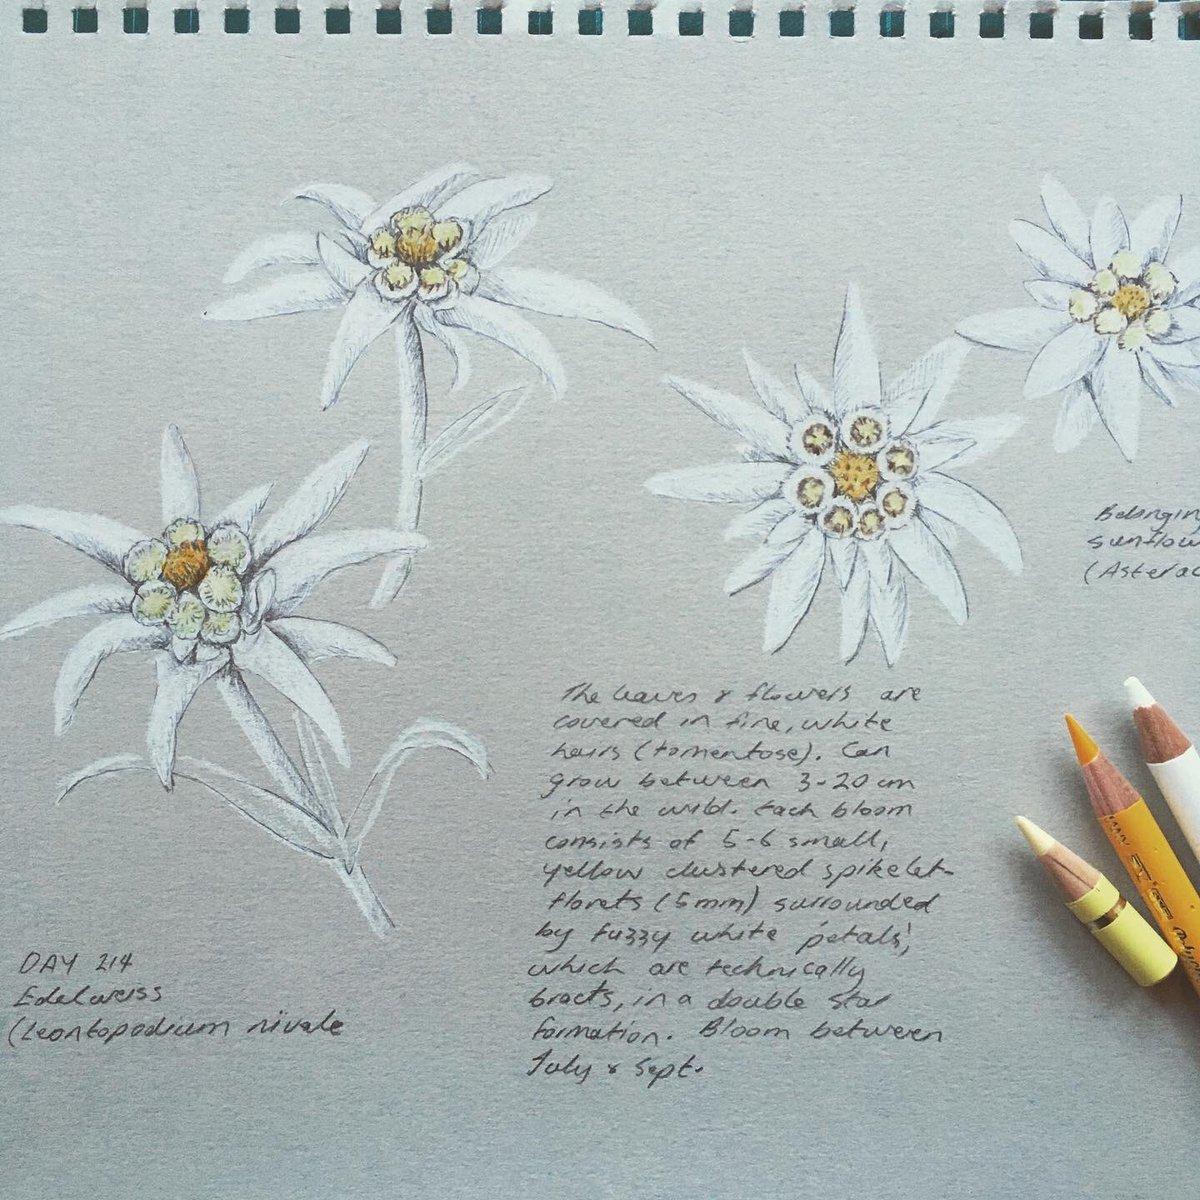 Day 24. Edelweiss (Leontopodium nivale). Coloured pencil and graphite on grey pastel paper.  #art #botanical #natureartist  #botanicaldrawing #sketch #botanicalartist #leontopodiumnivale #swissflowers #edelweiss #wip #alpineflowers #dailydrawing #asketchaday #jennyhaslimeierpic.twitter.com/TWETKas4X4